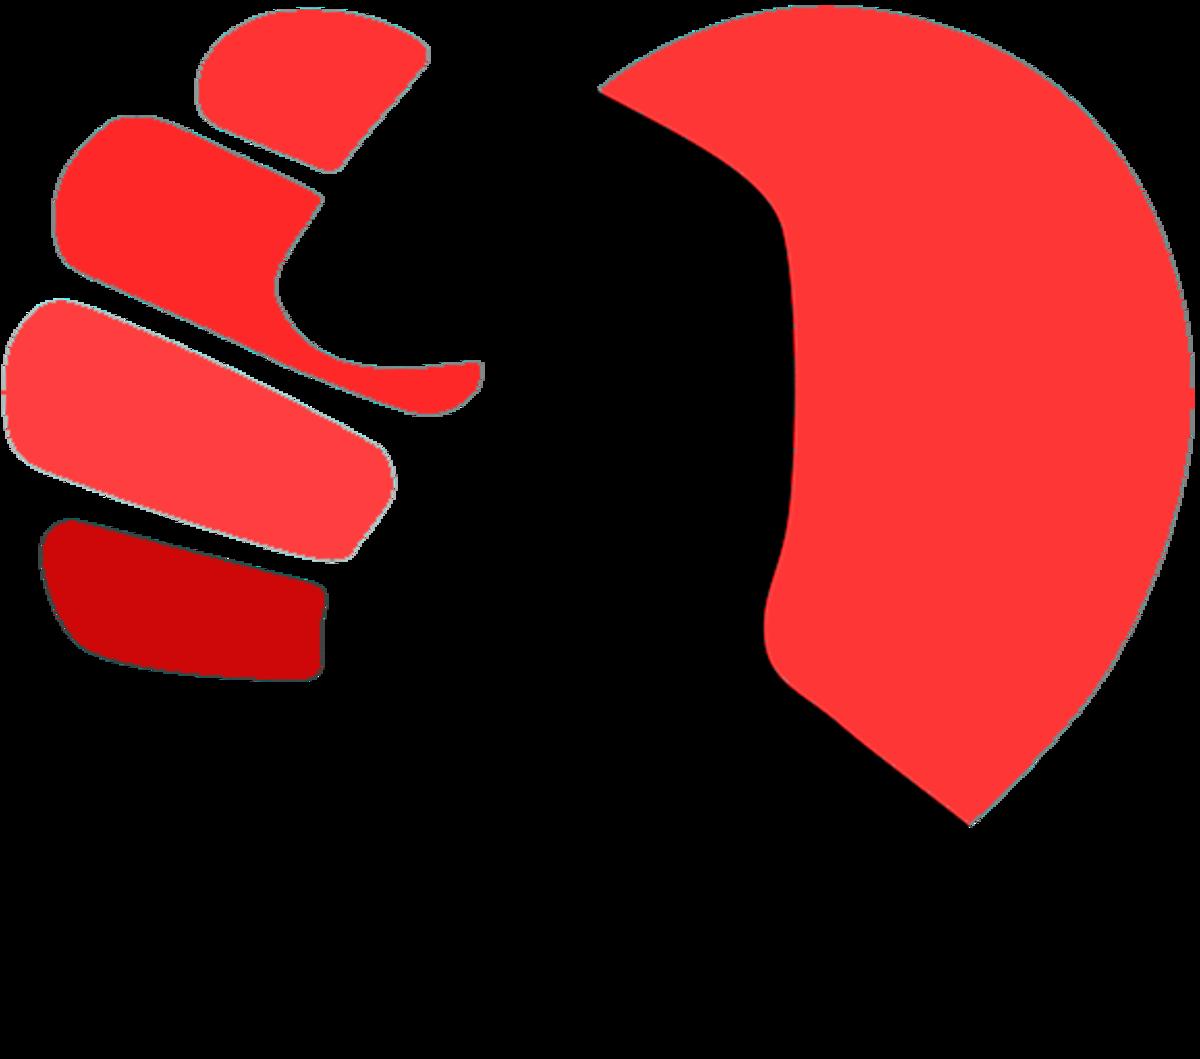 A Journal of Activism